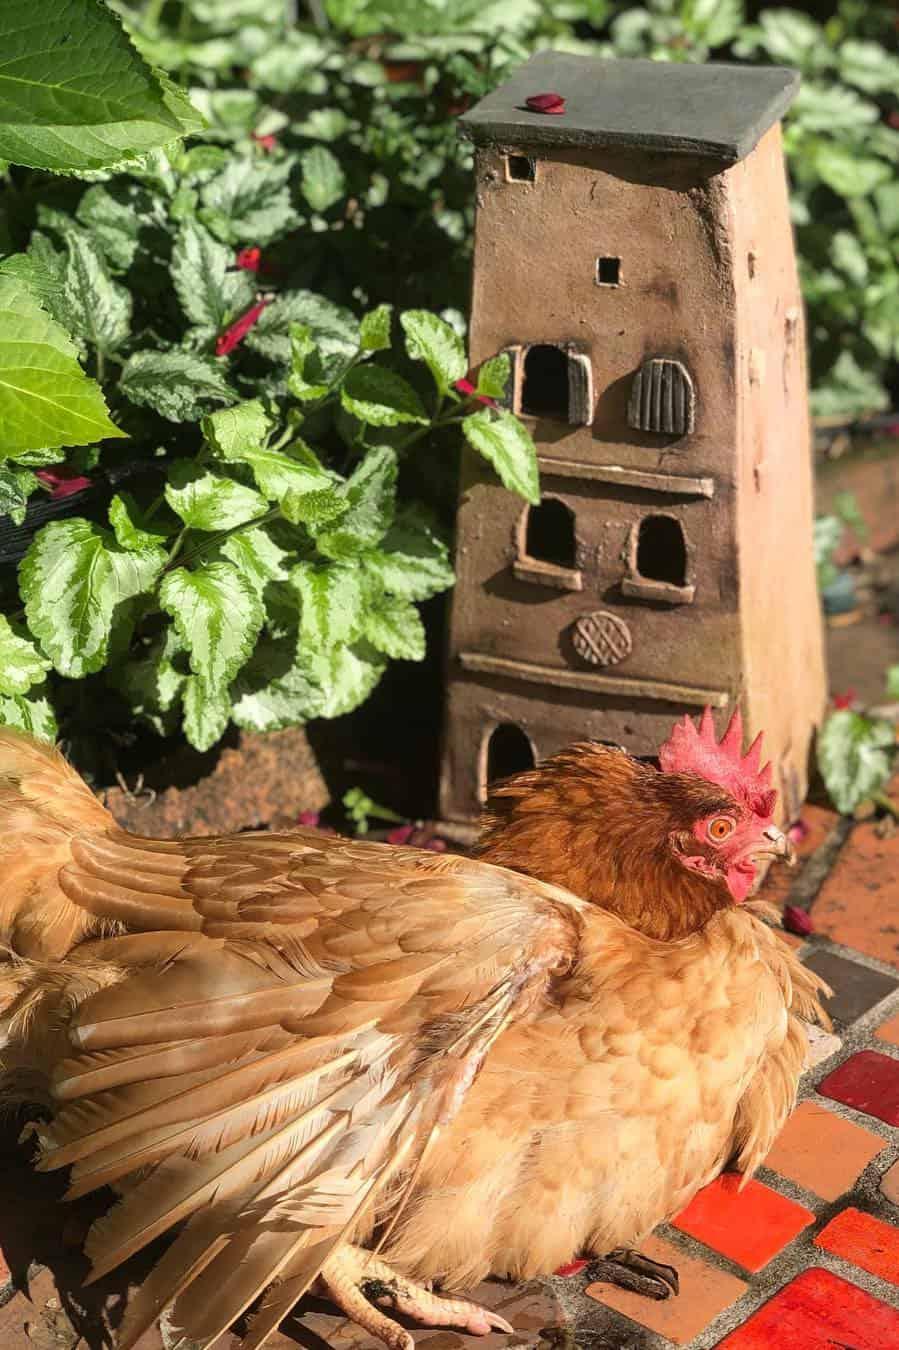 Red Shaver Chicken breed